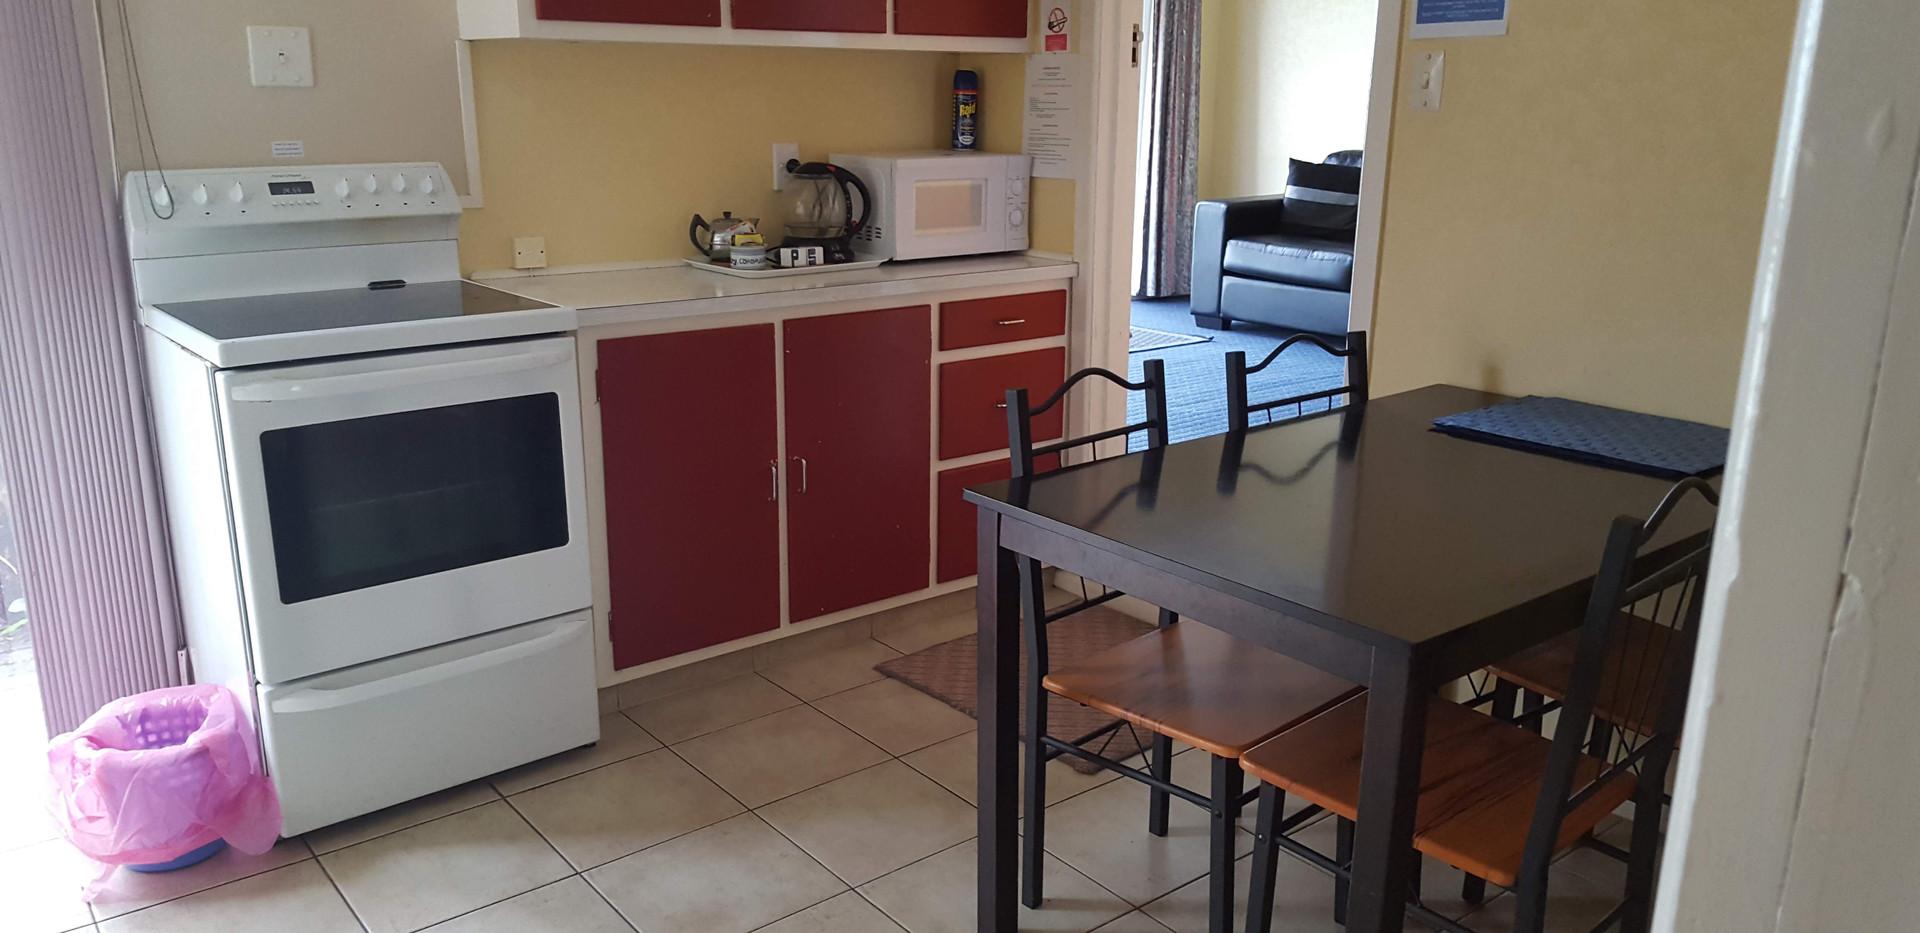 Seaspray Motel 2 bedroom unit, seperate 1960s kitchen.